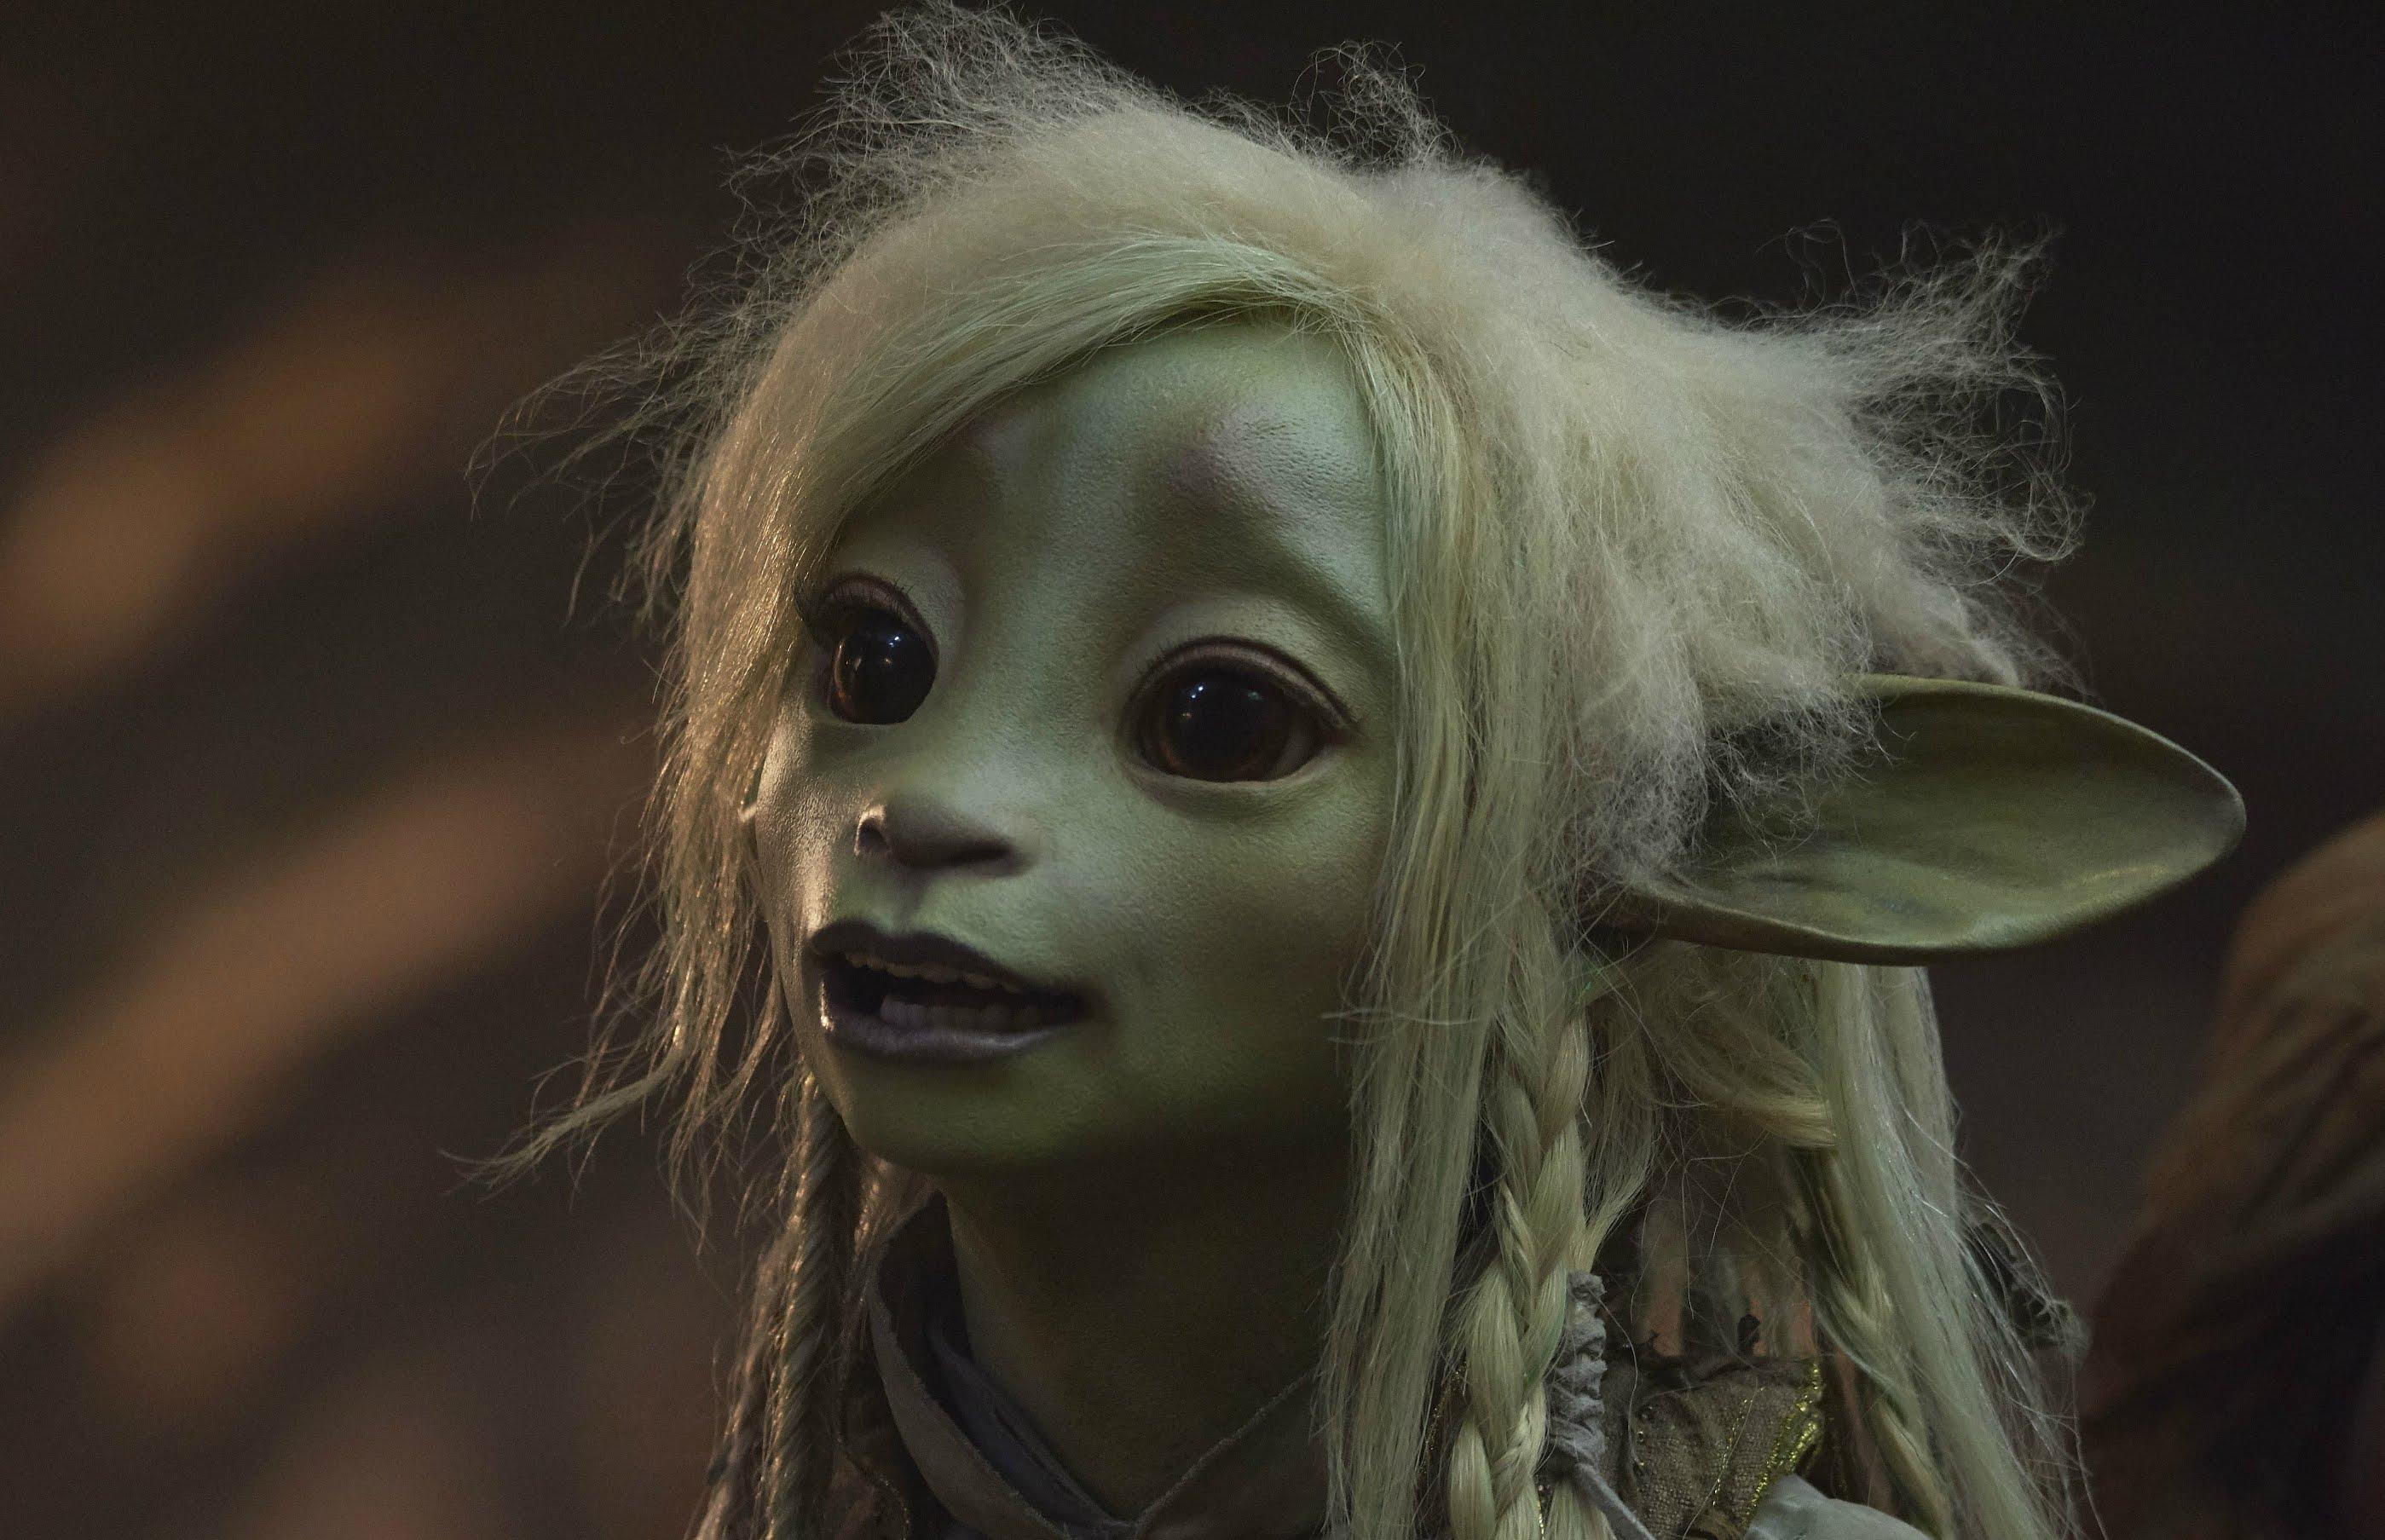 The Dark Crystal : 80年代の人気ファンタジー映画「ザ・ダーク・クリスタル」の前日譚を描く新シリーズ「エイジ・オブ・レジスタンス」が、ゲルフリン族の主人公たちの写真の初公開にあわせて、アニヤ・テイラー=ジョイをはじめとする豪華な声優陣のキャストを発表 ! !